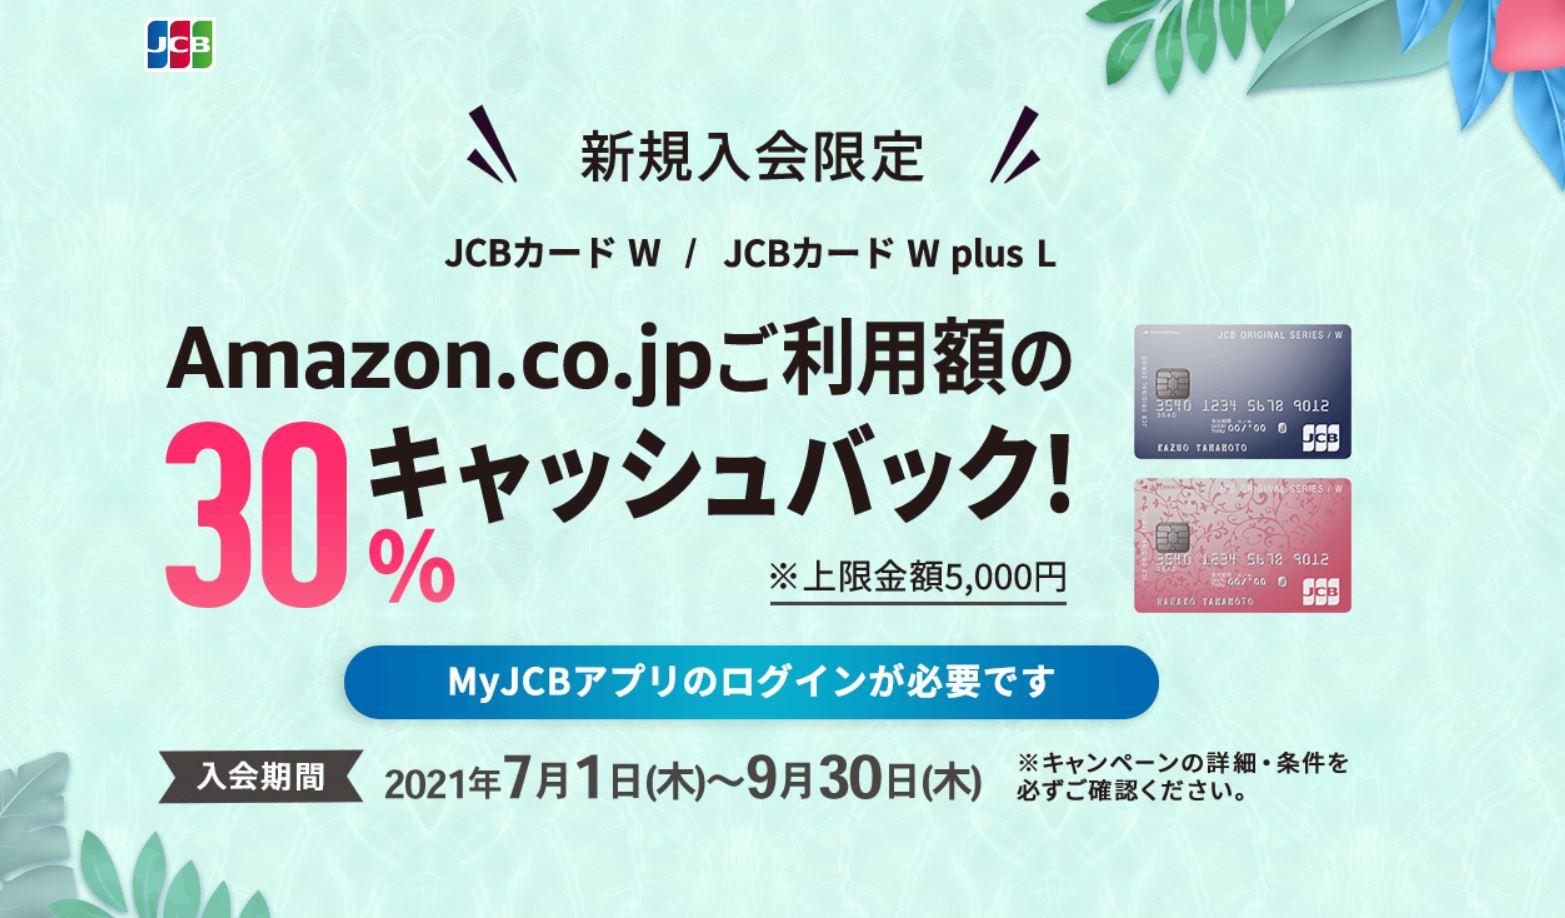 Amazon30%キャッシュバックキャンペーン